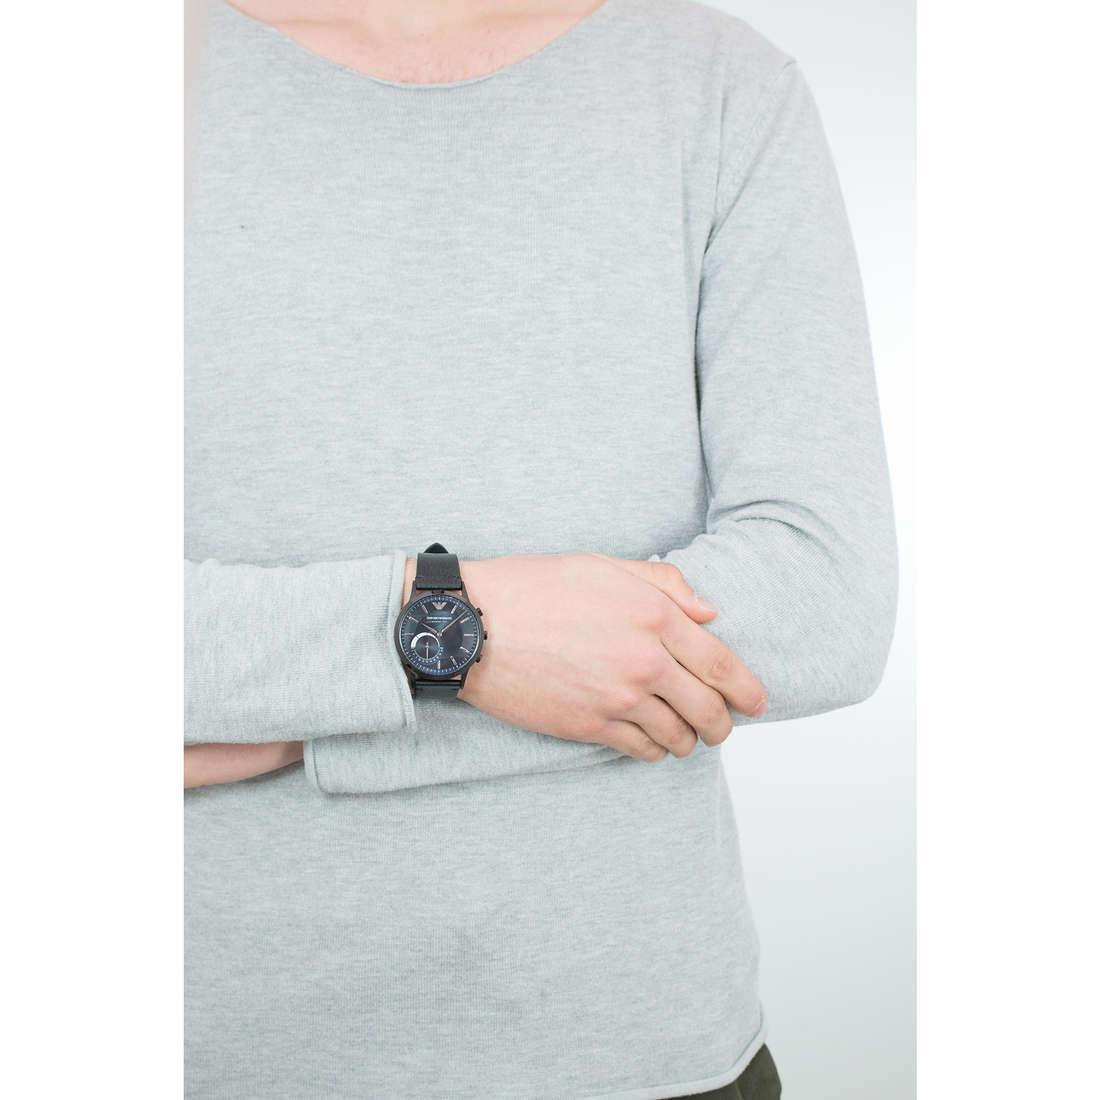 Emporio Armani Smartwatches uomo ART3004 indosso